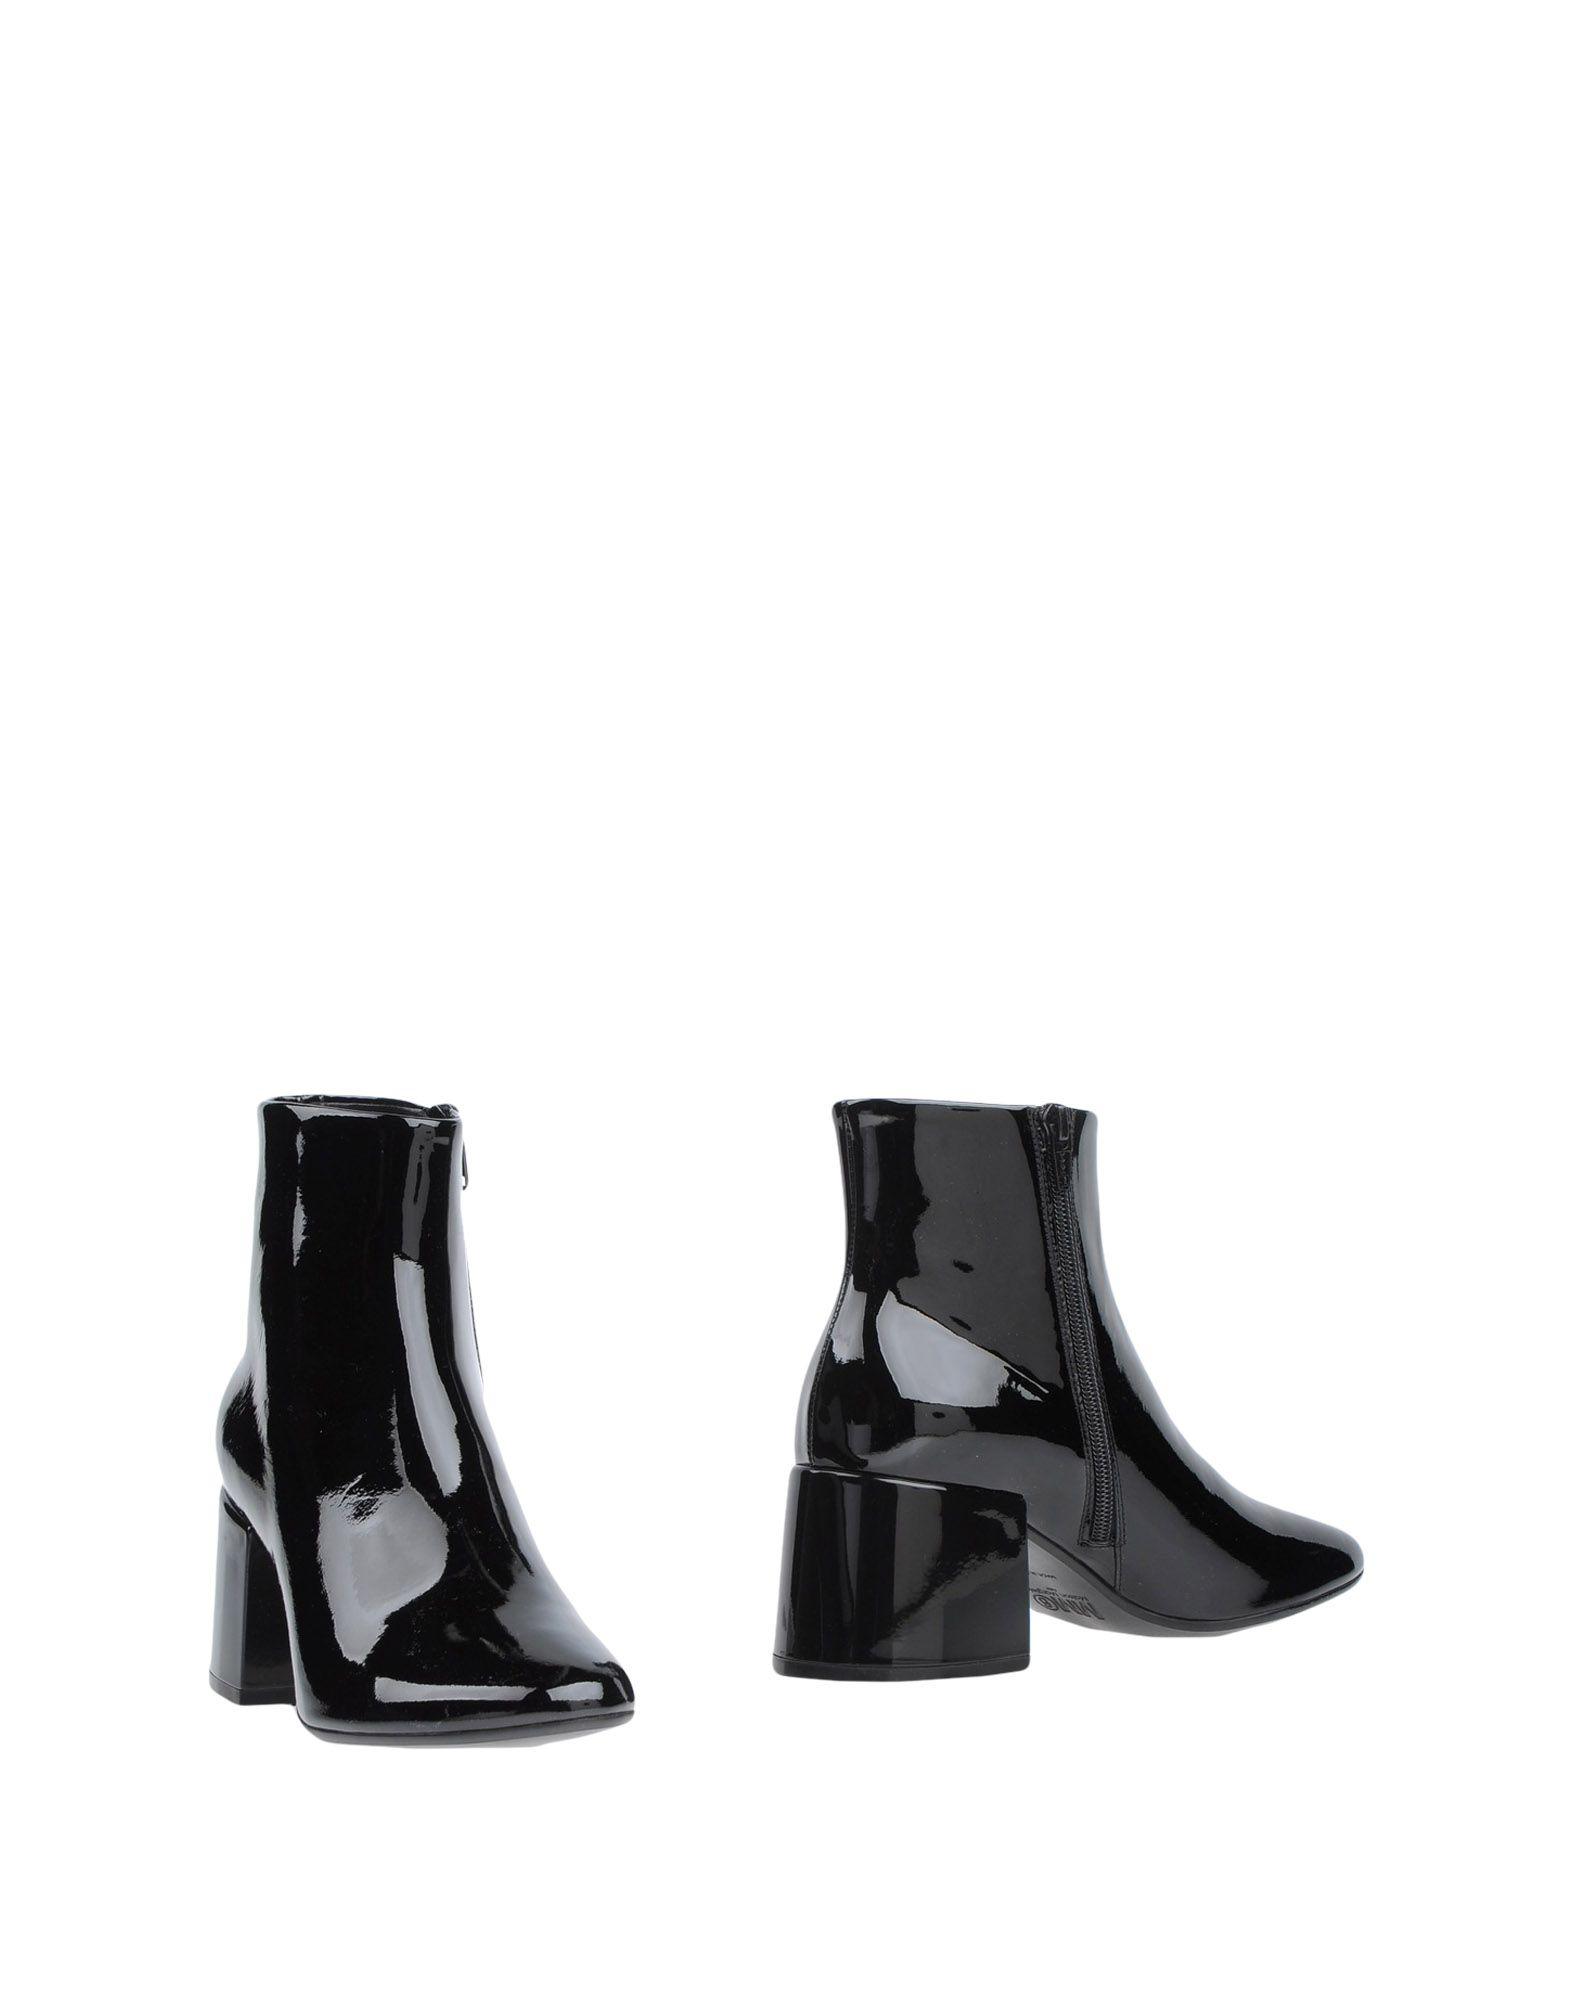 205350dfd7 Mm6 Maison Margiela Ankle Boot - Women Mm6 Maison Margiela Ankle ...